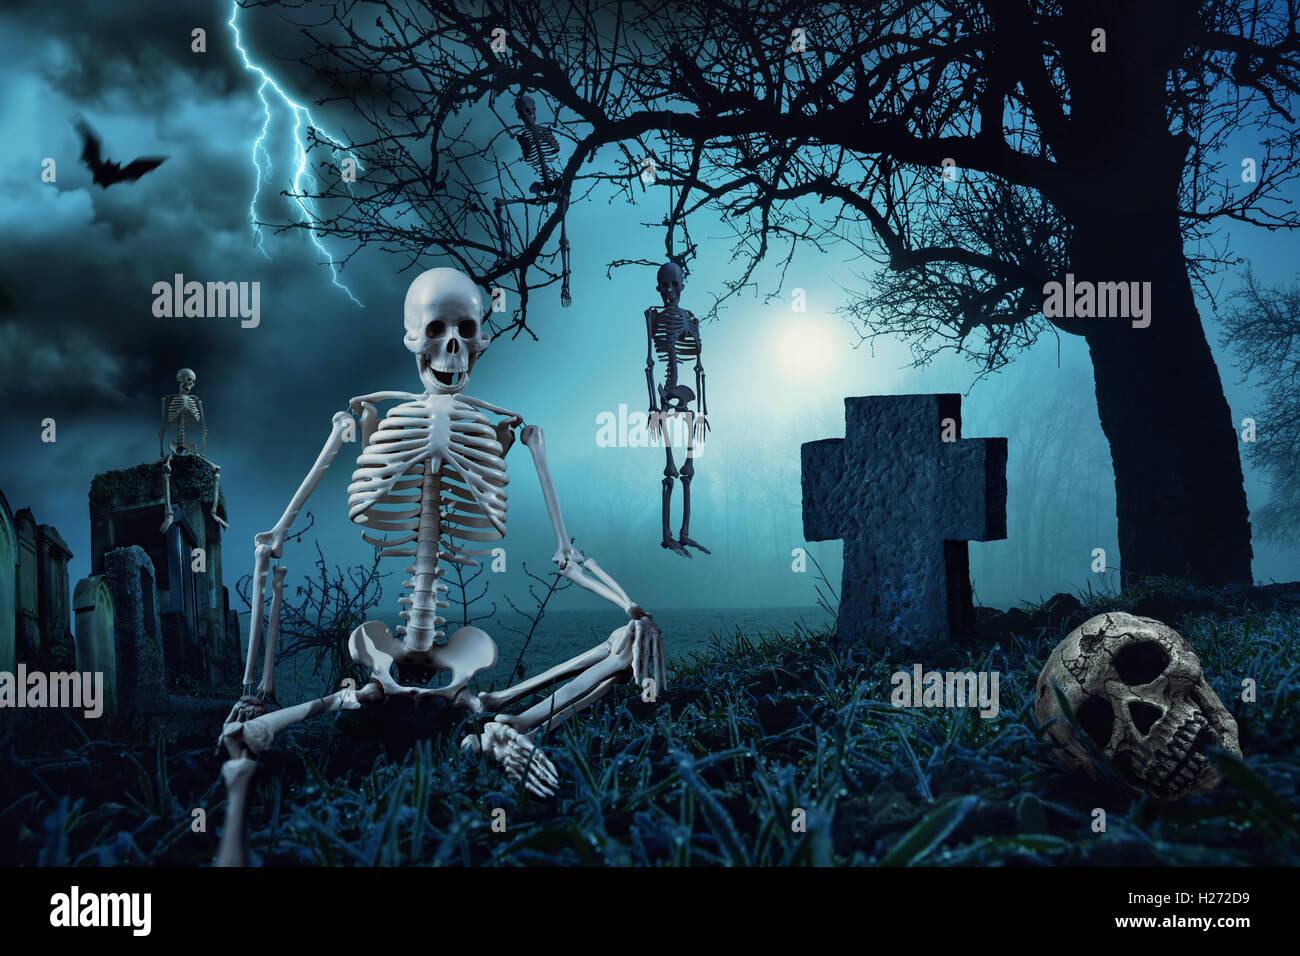 horror cemetery stock photos & horror cemetery stock images - alamy